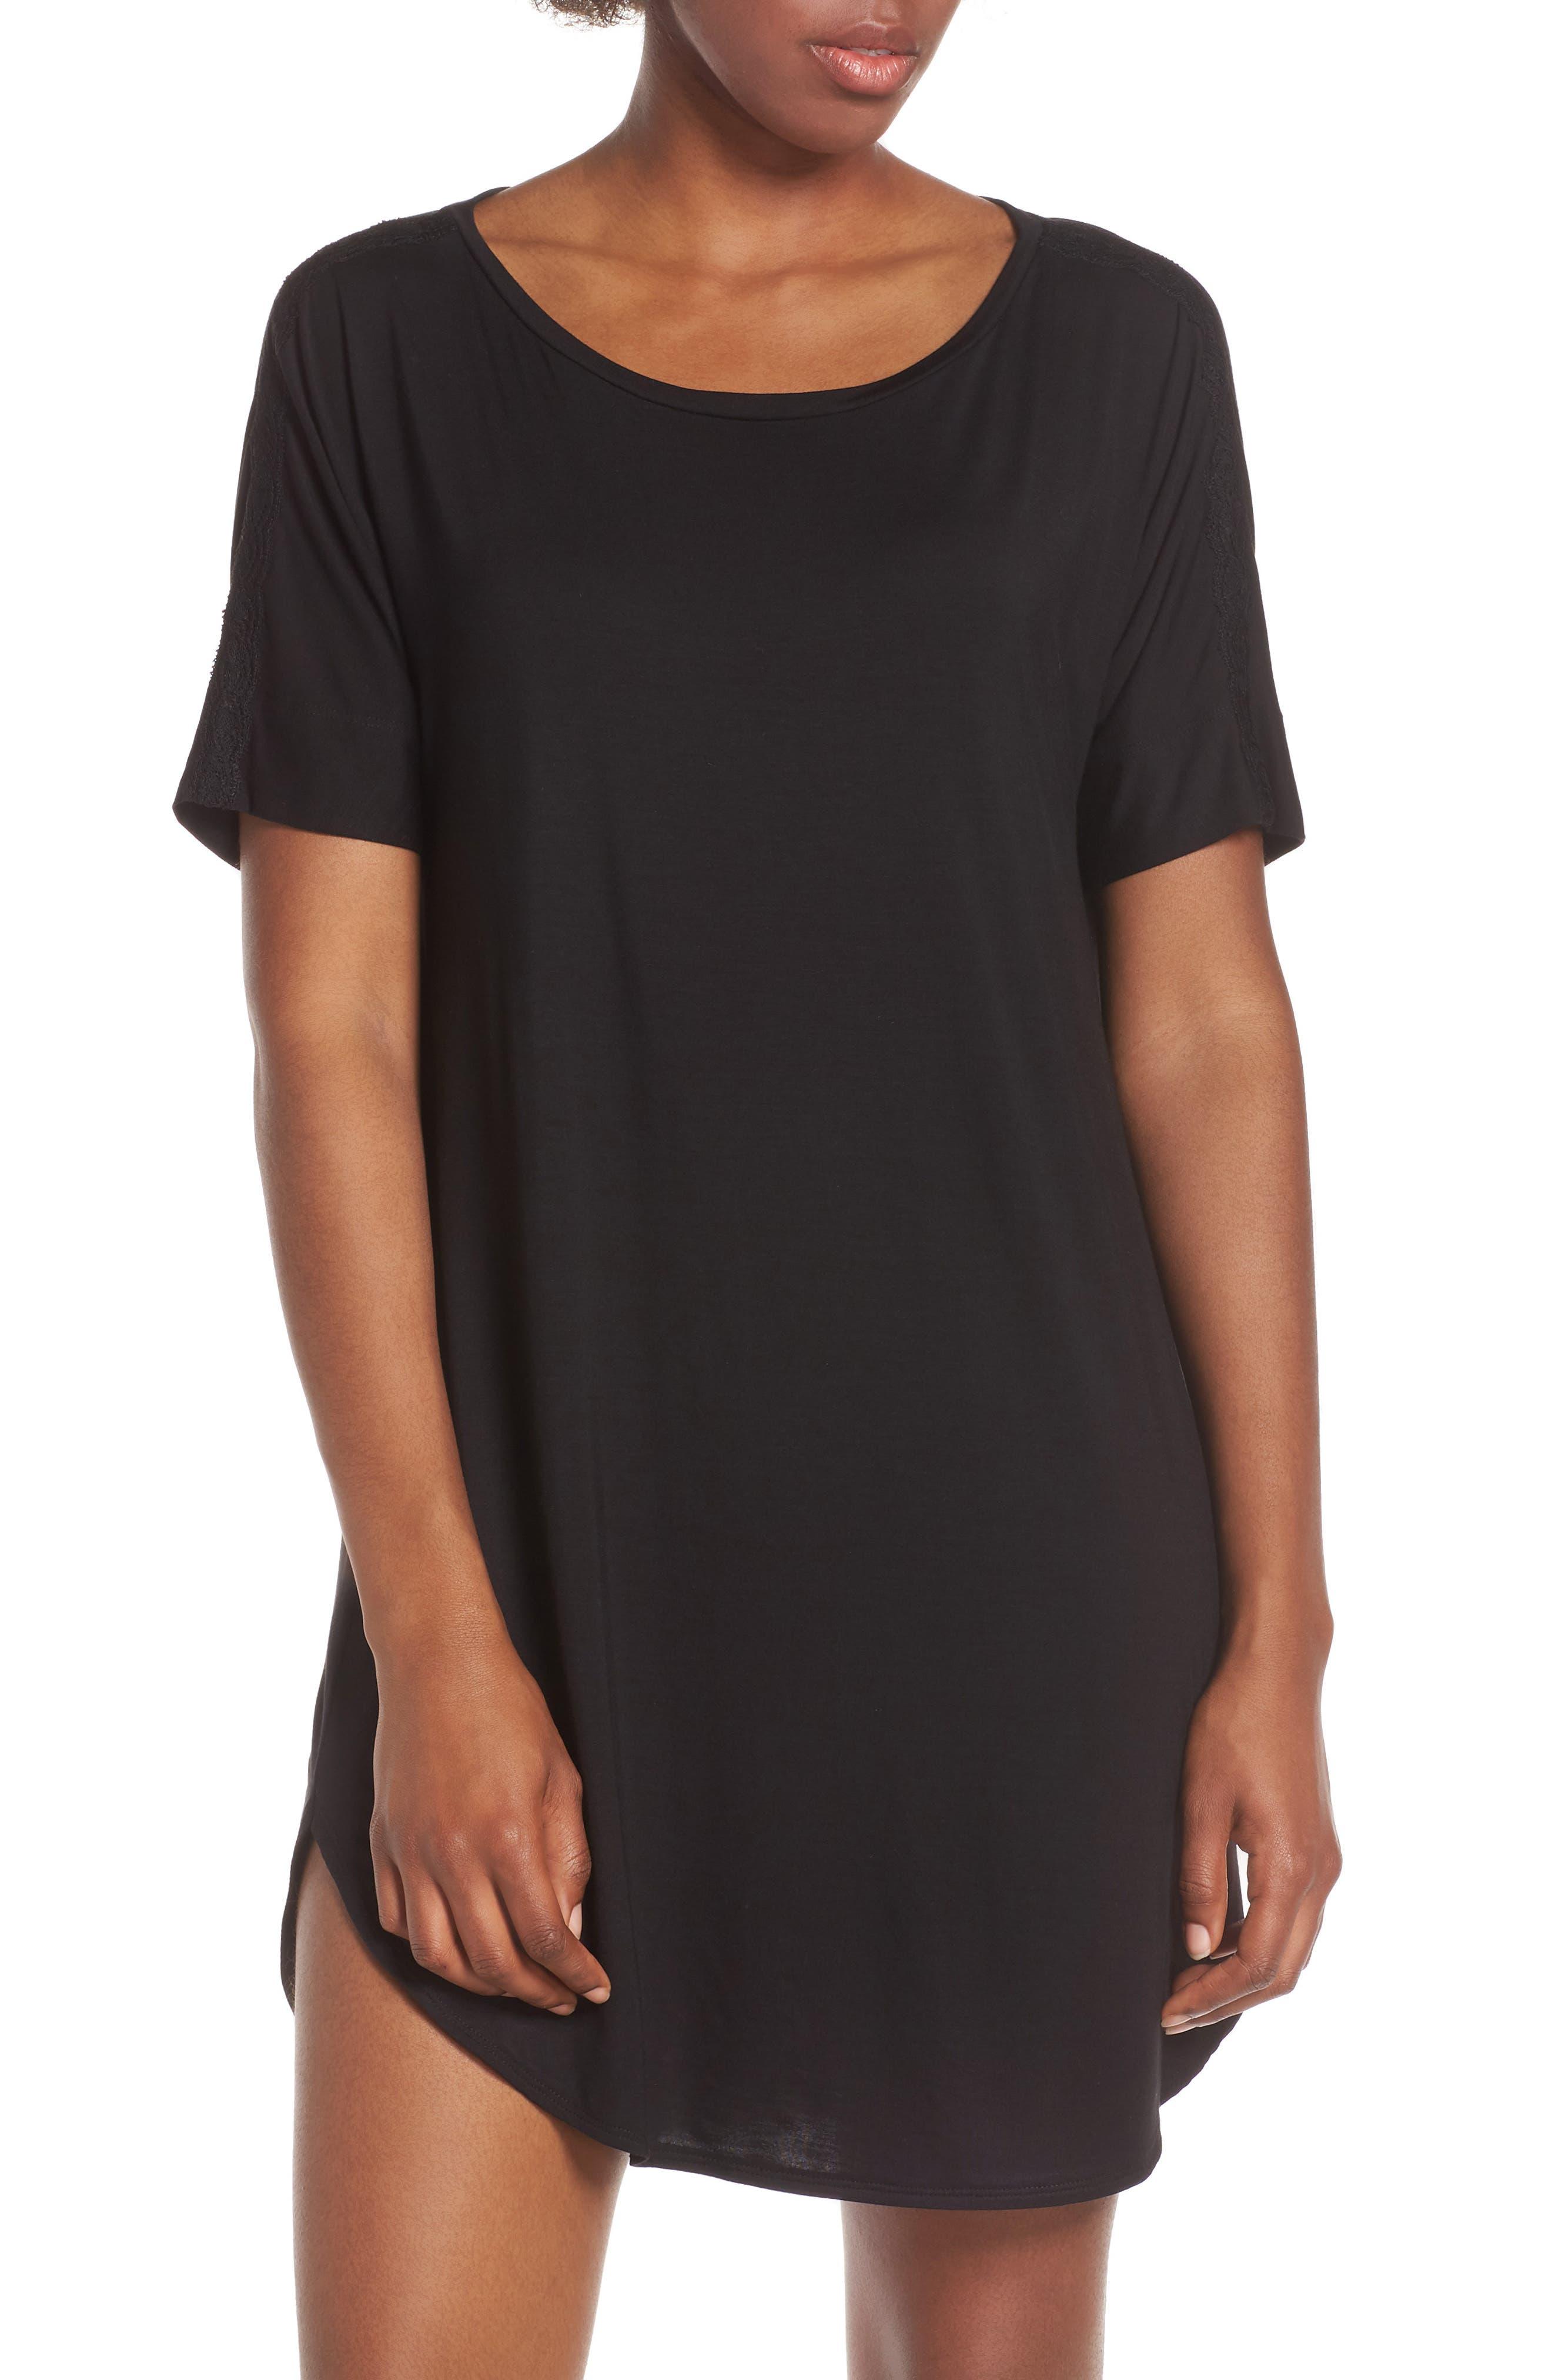 NATORI Feathers Essential Sleep Shirt, Main, color, BLACK